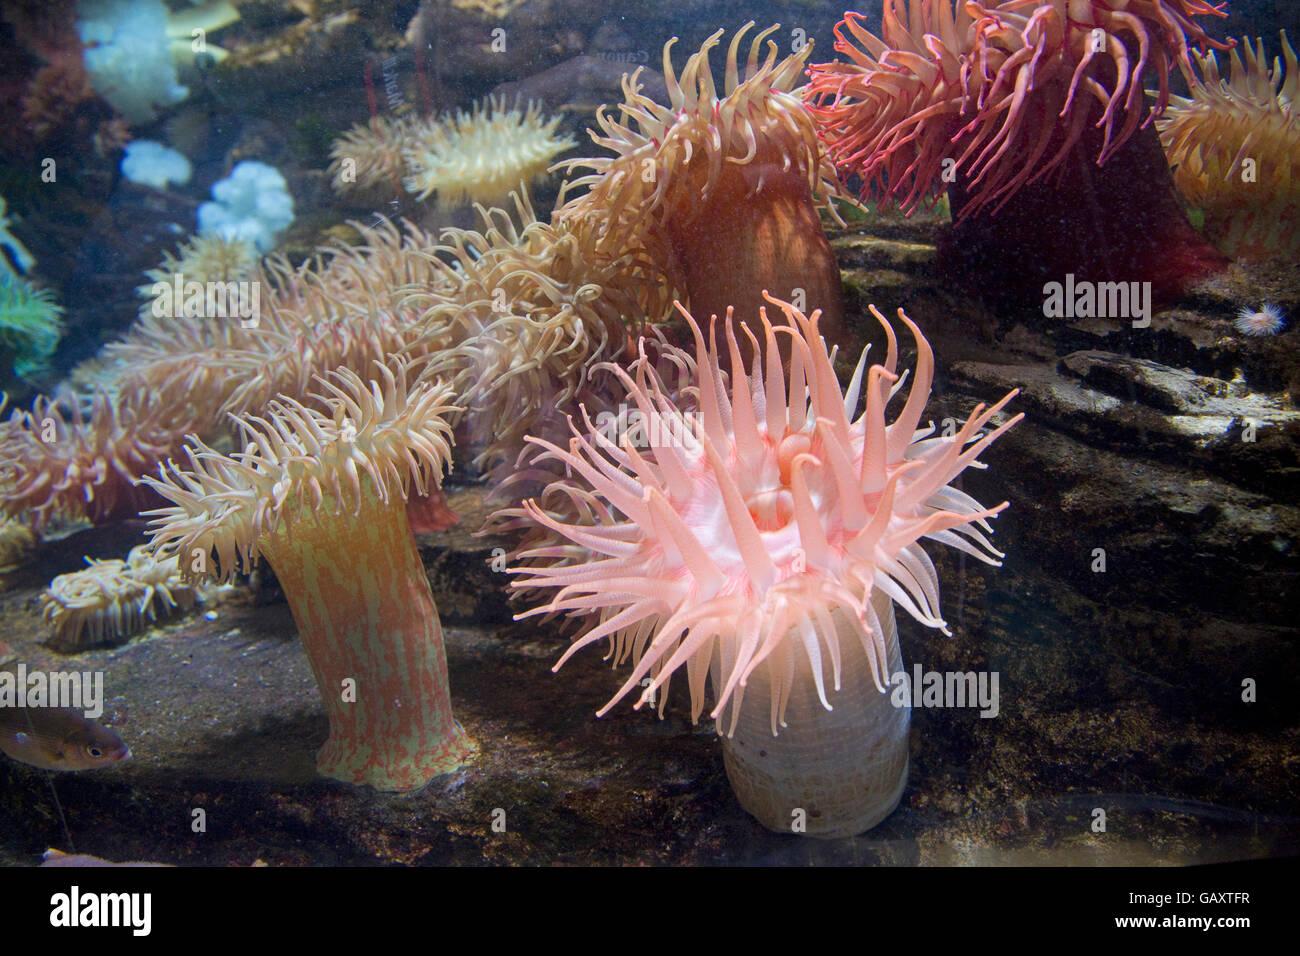 Variety of coloured sea anemones Oceanarium France - Stock Image